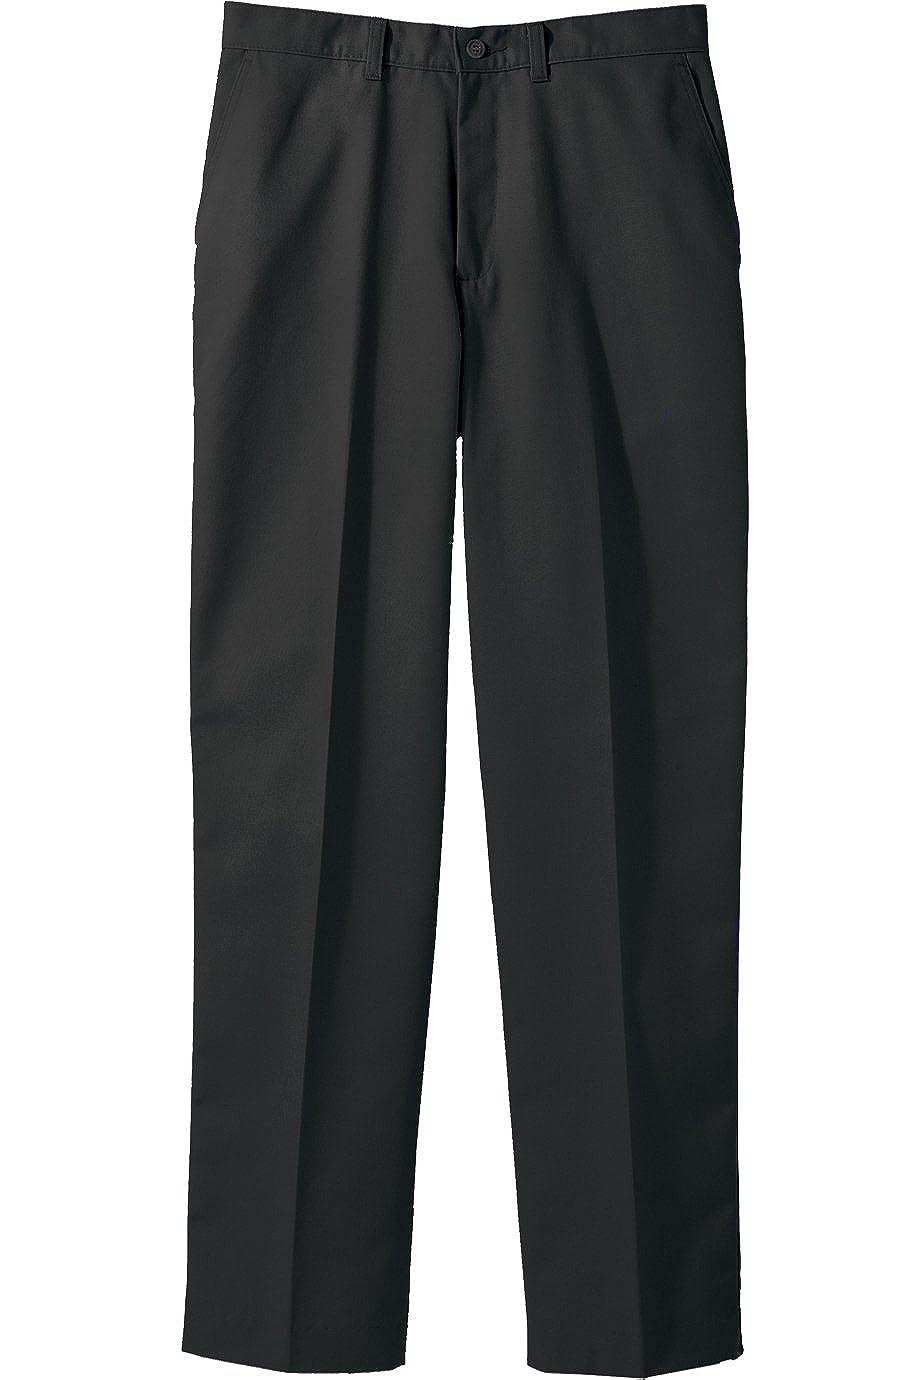 Black 34-32 Ed Garments MenS 2570 One Back Pocket Dress Pants